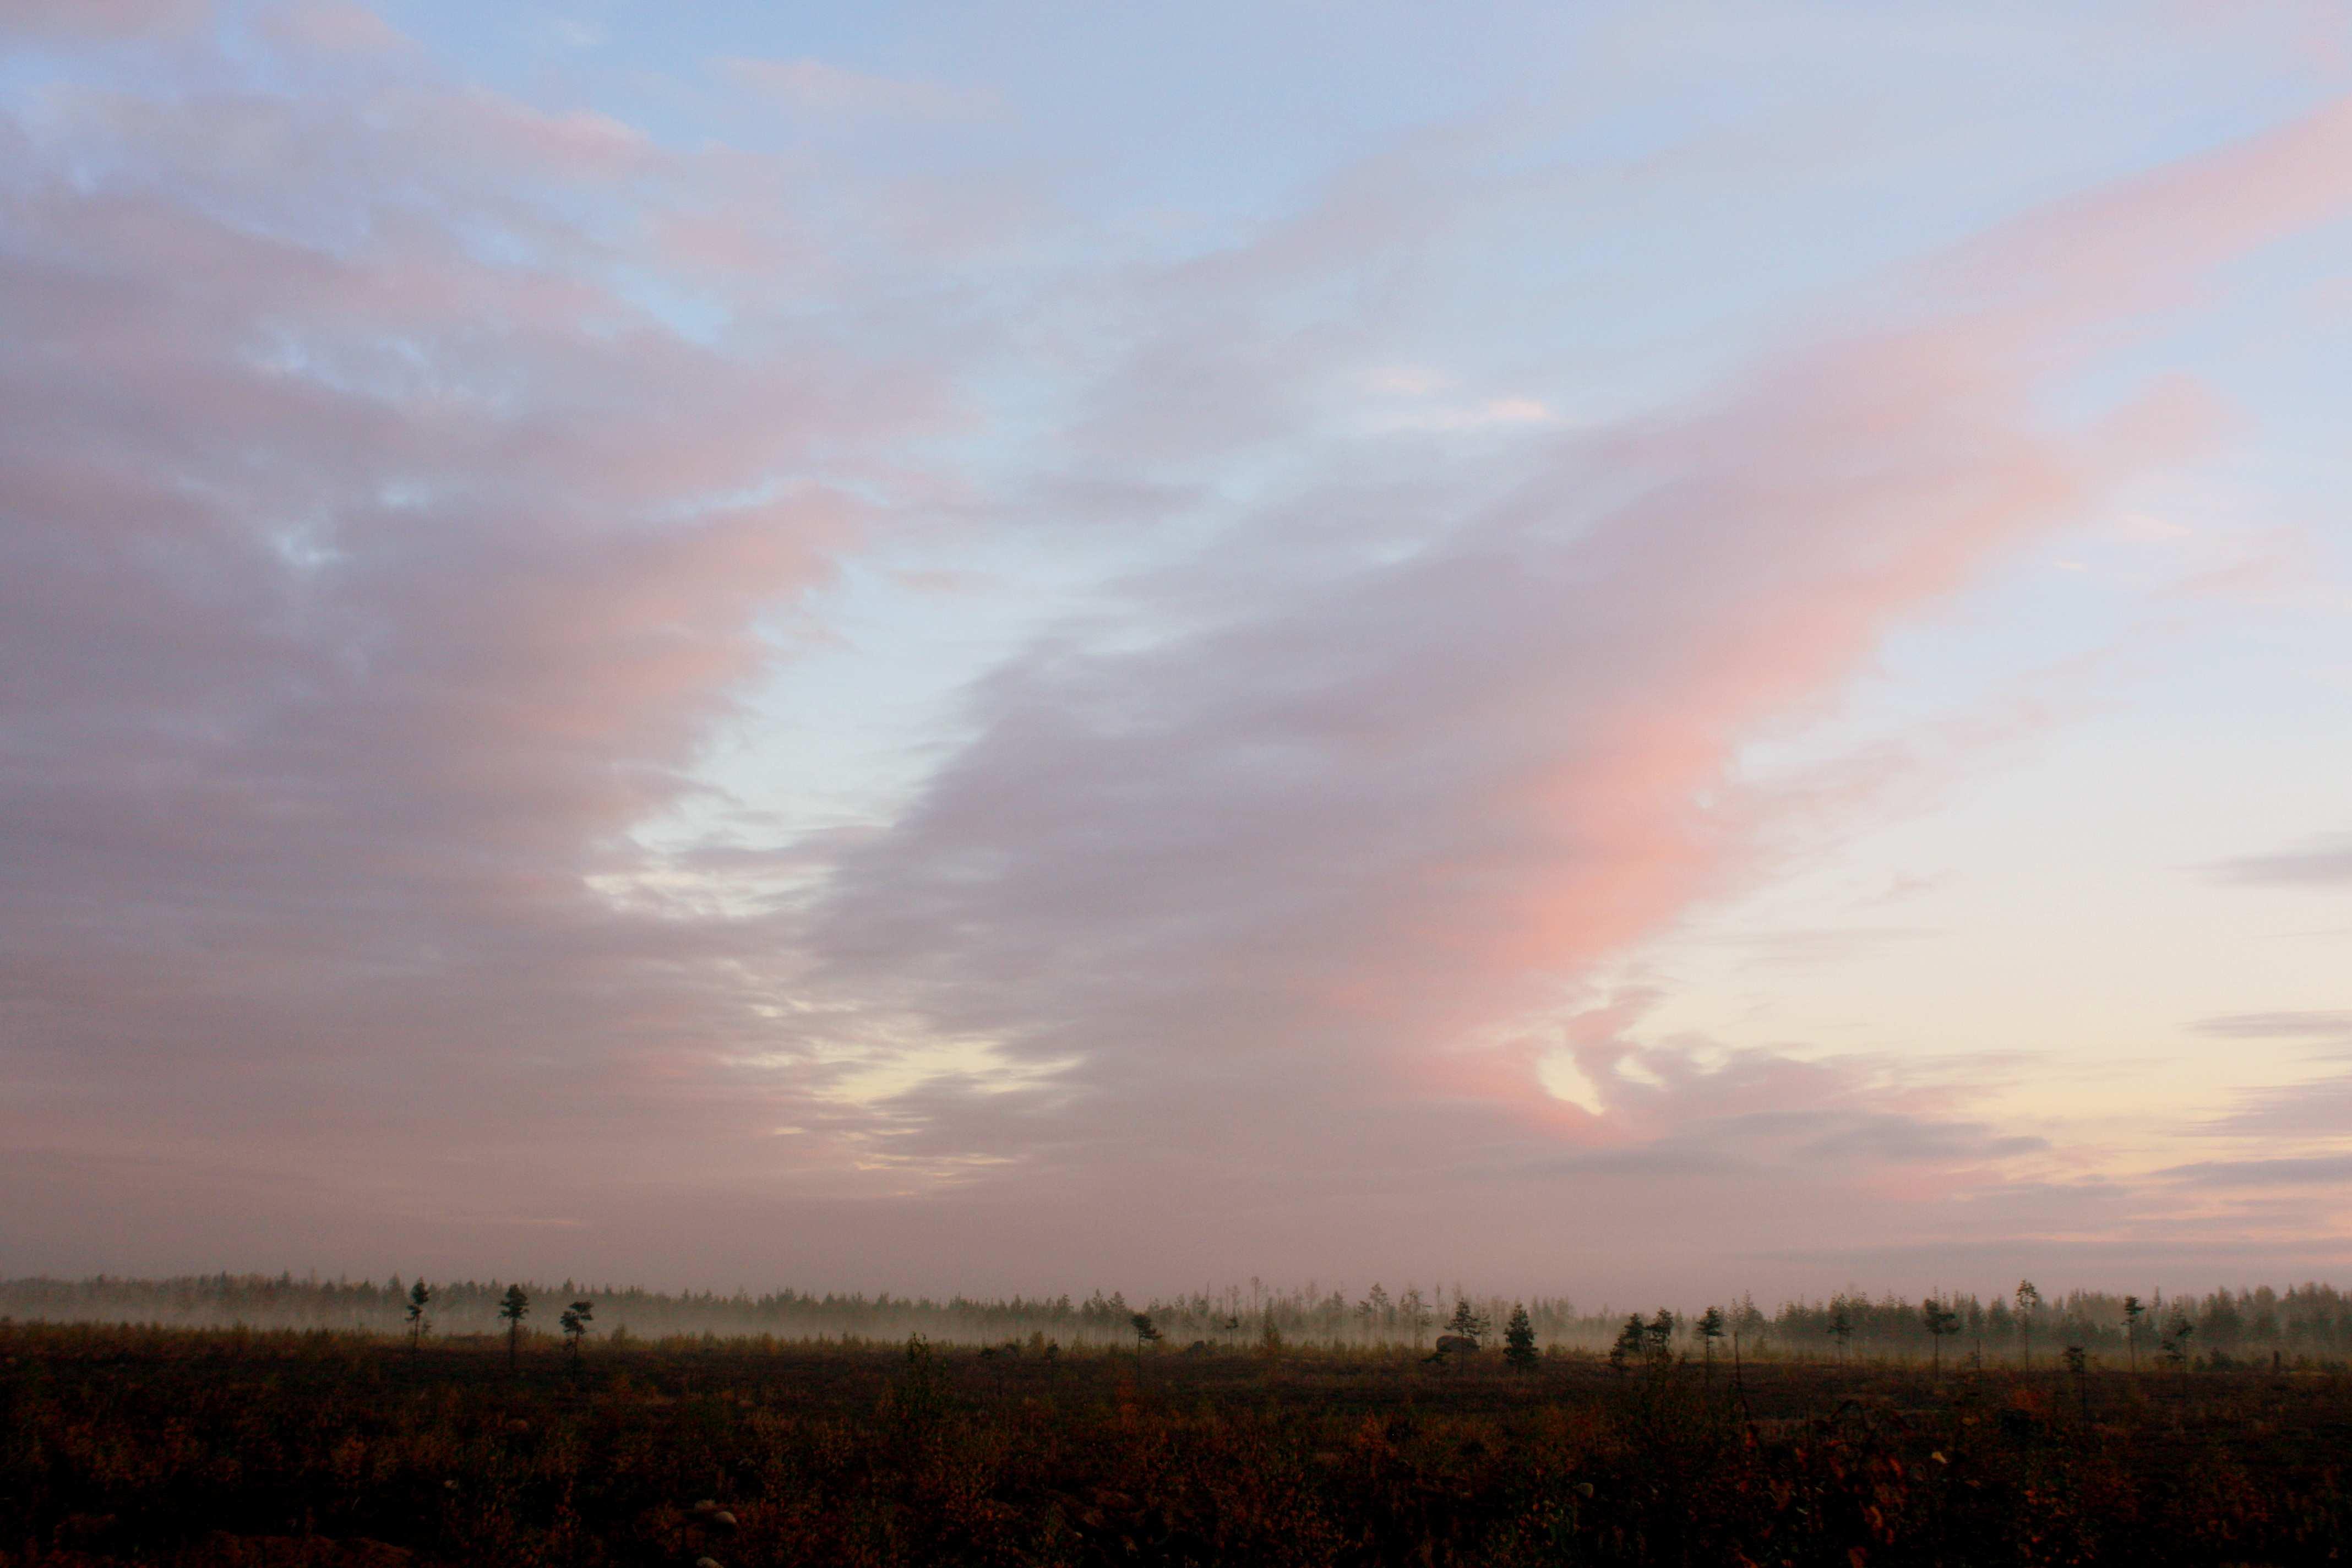 Осеннее утрo. Автор фото: Йохан Метте